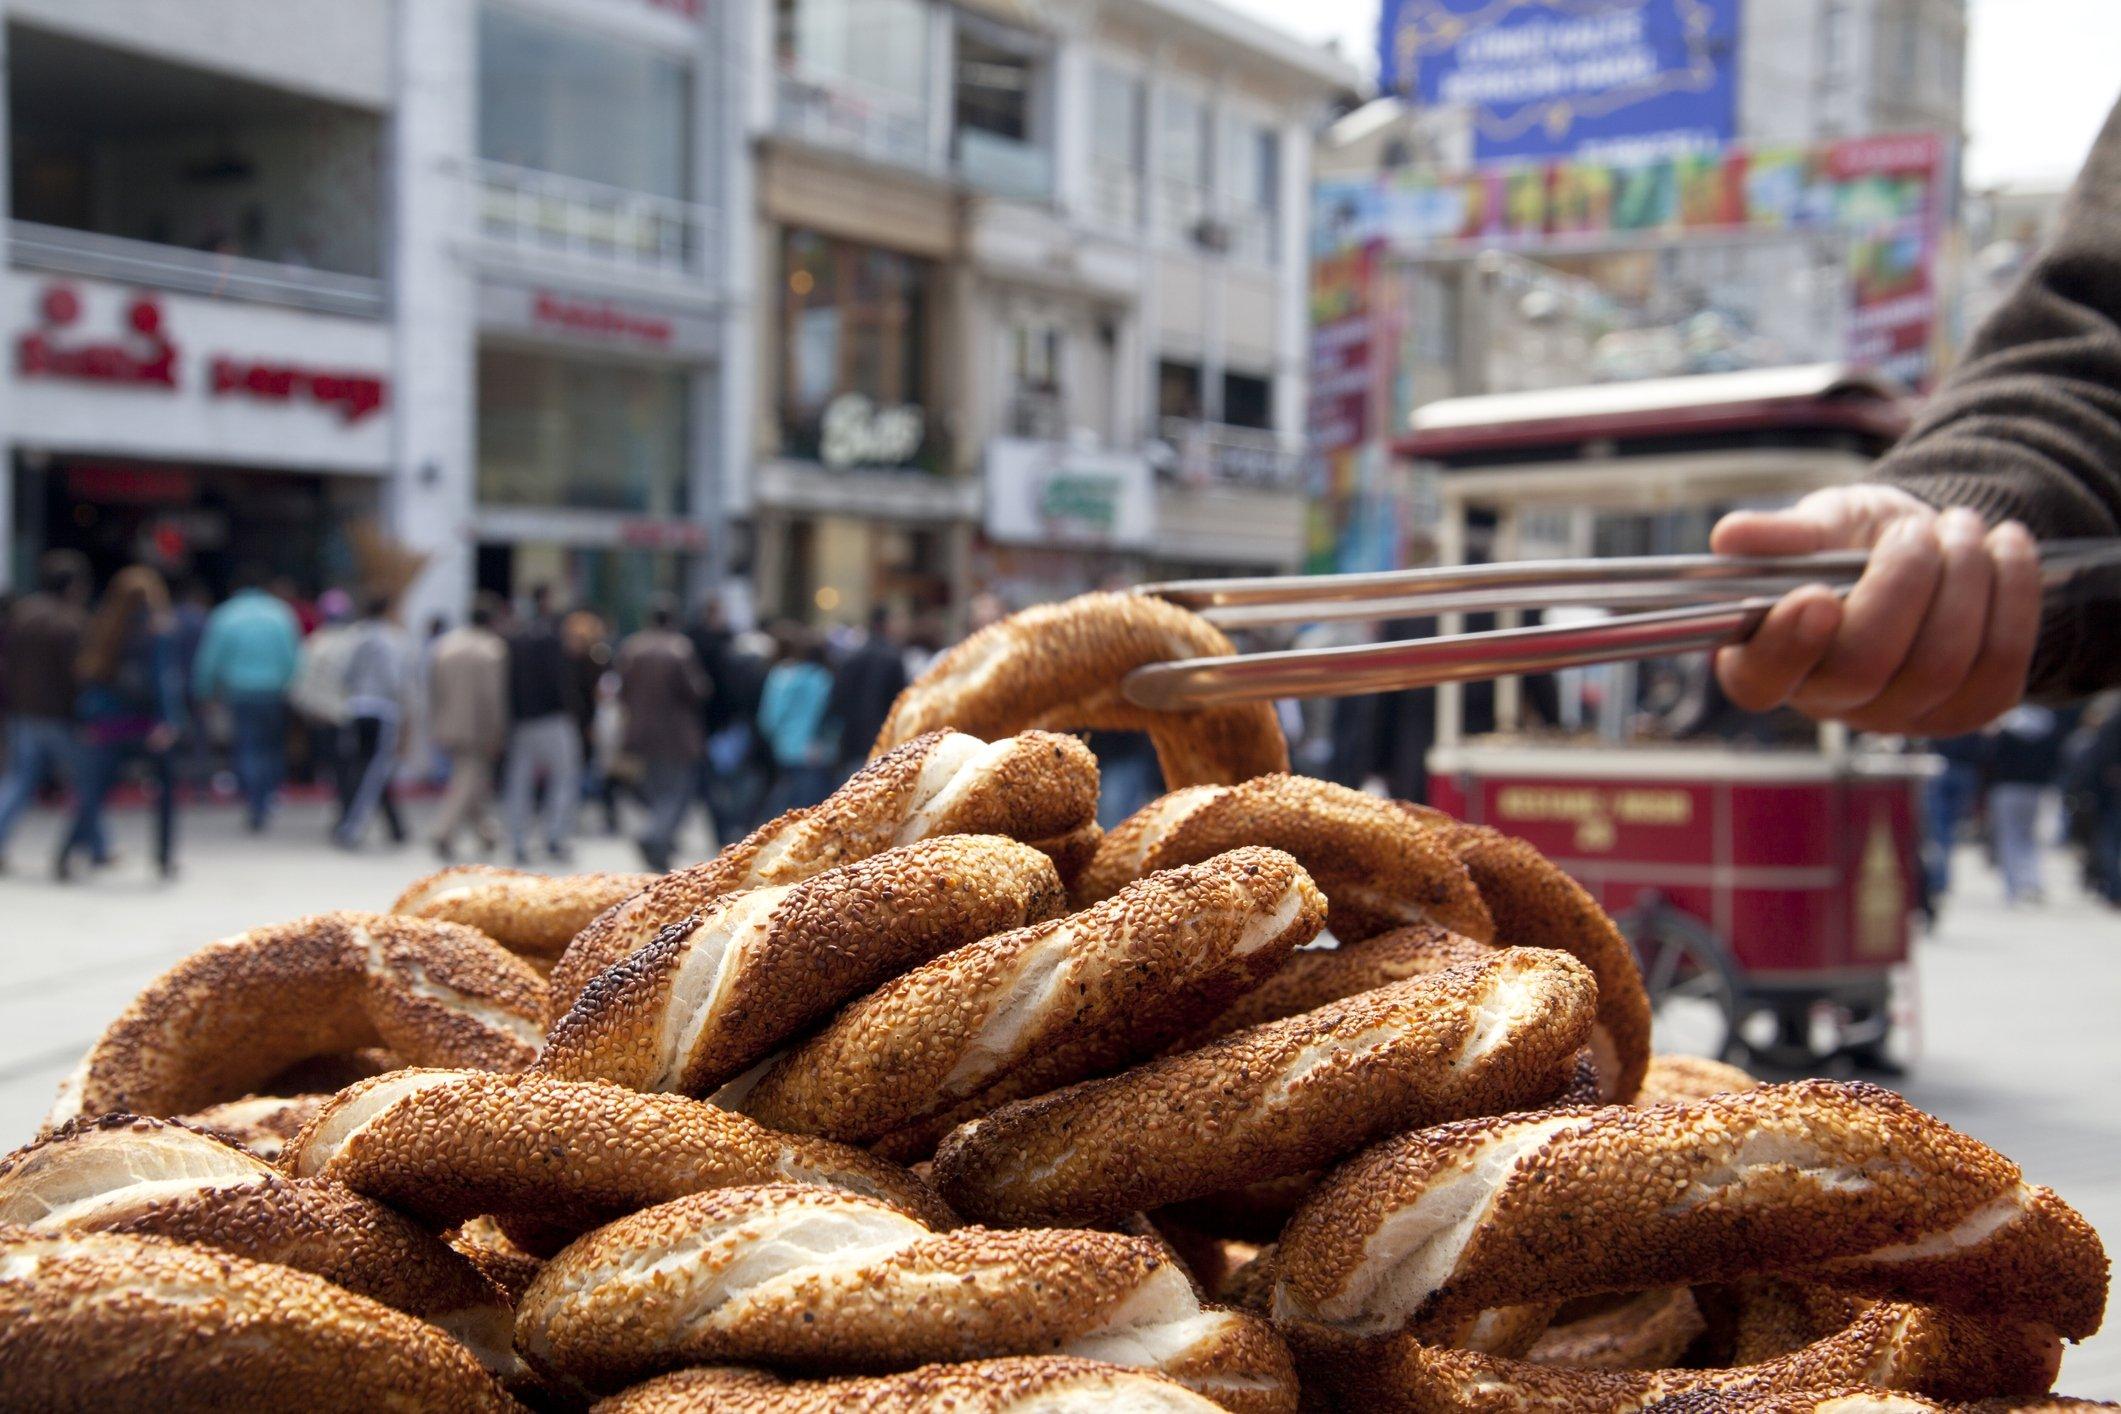 A street vendor sells simit on Istiklal Street in Taksim, Istanbul, April, 17, 2011. (iStock Photo)